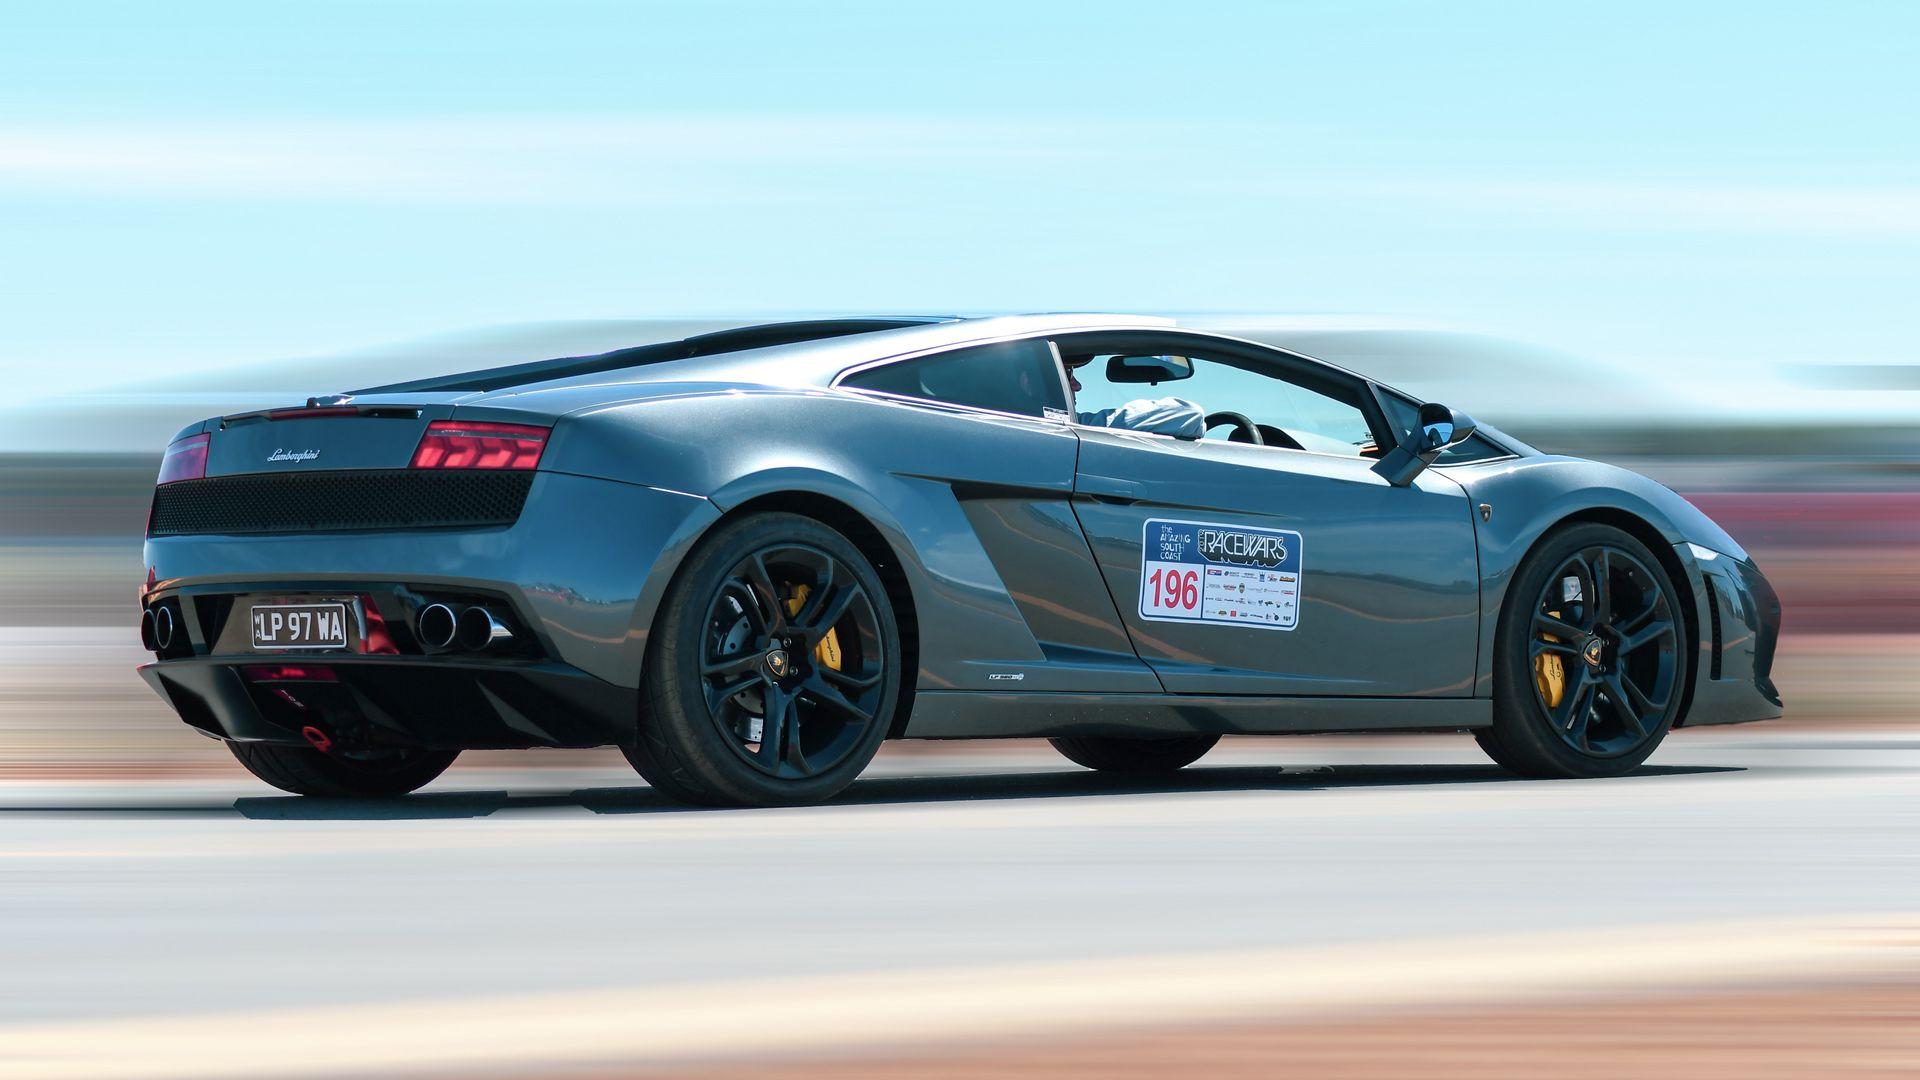 The Best Wallpapers Related to Lamborghini Aventador, Lamborghini, Sportscar (8)